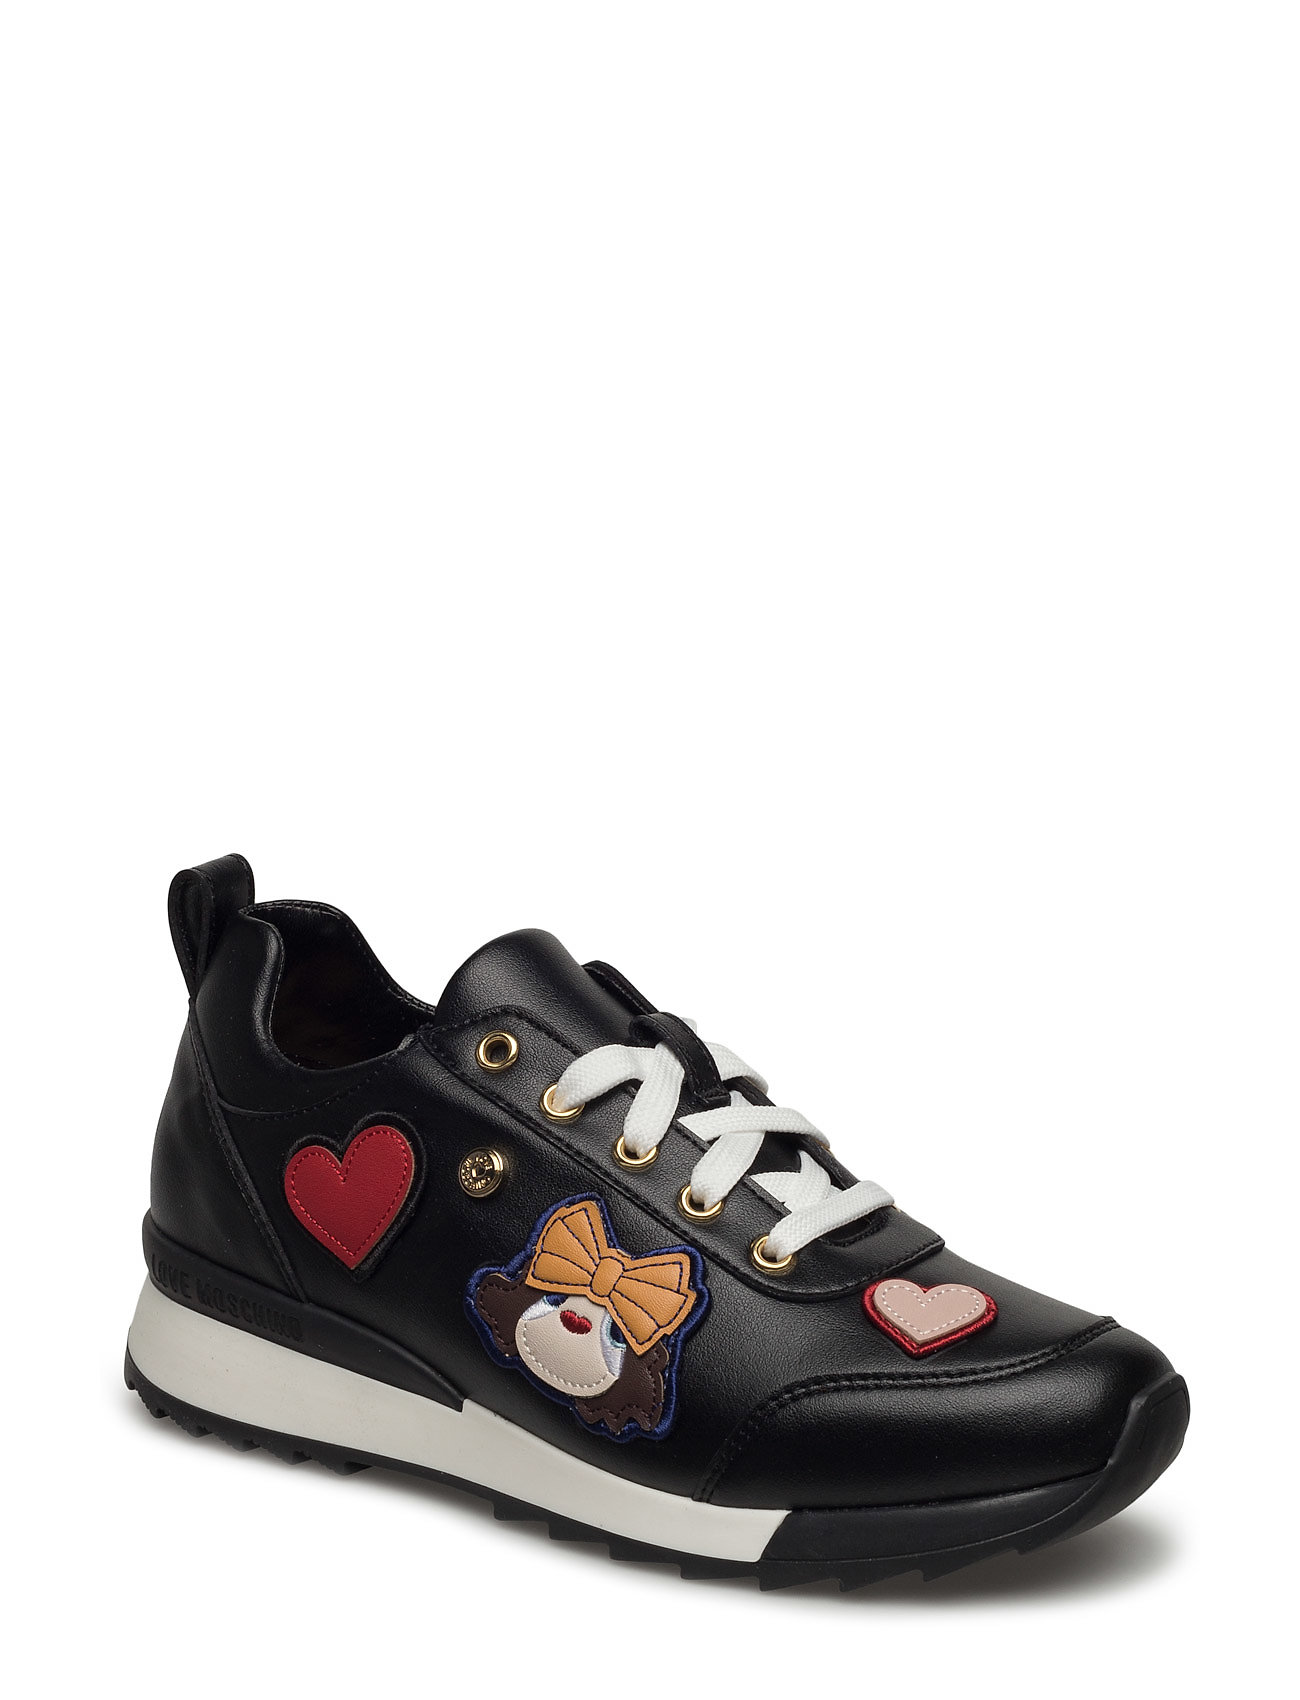 Love Moschino-Sneakers Love Moschino Sko til Kvinder i Sort